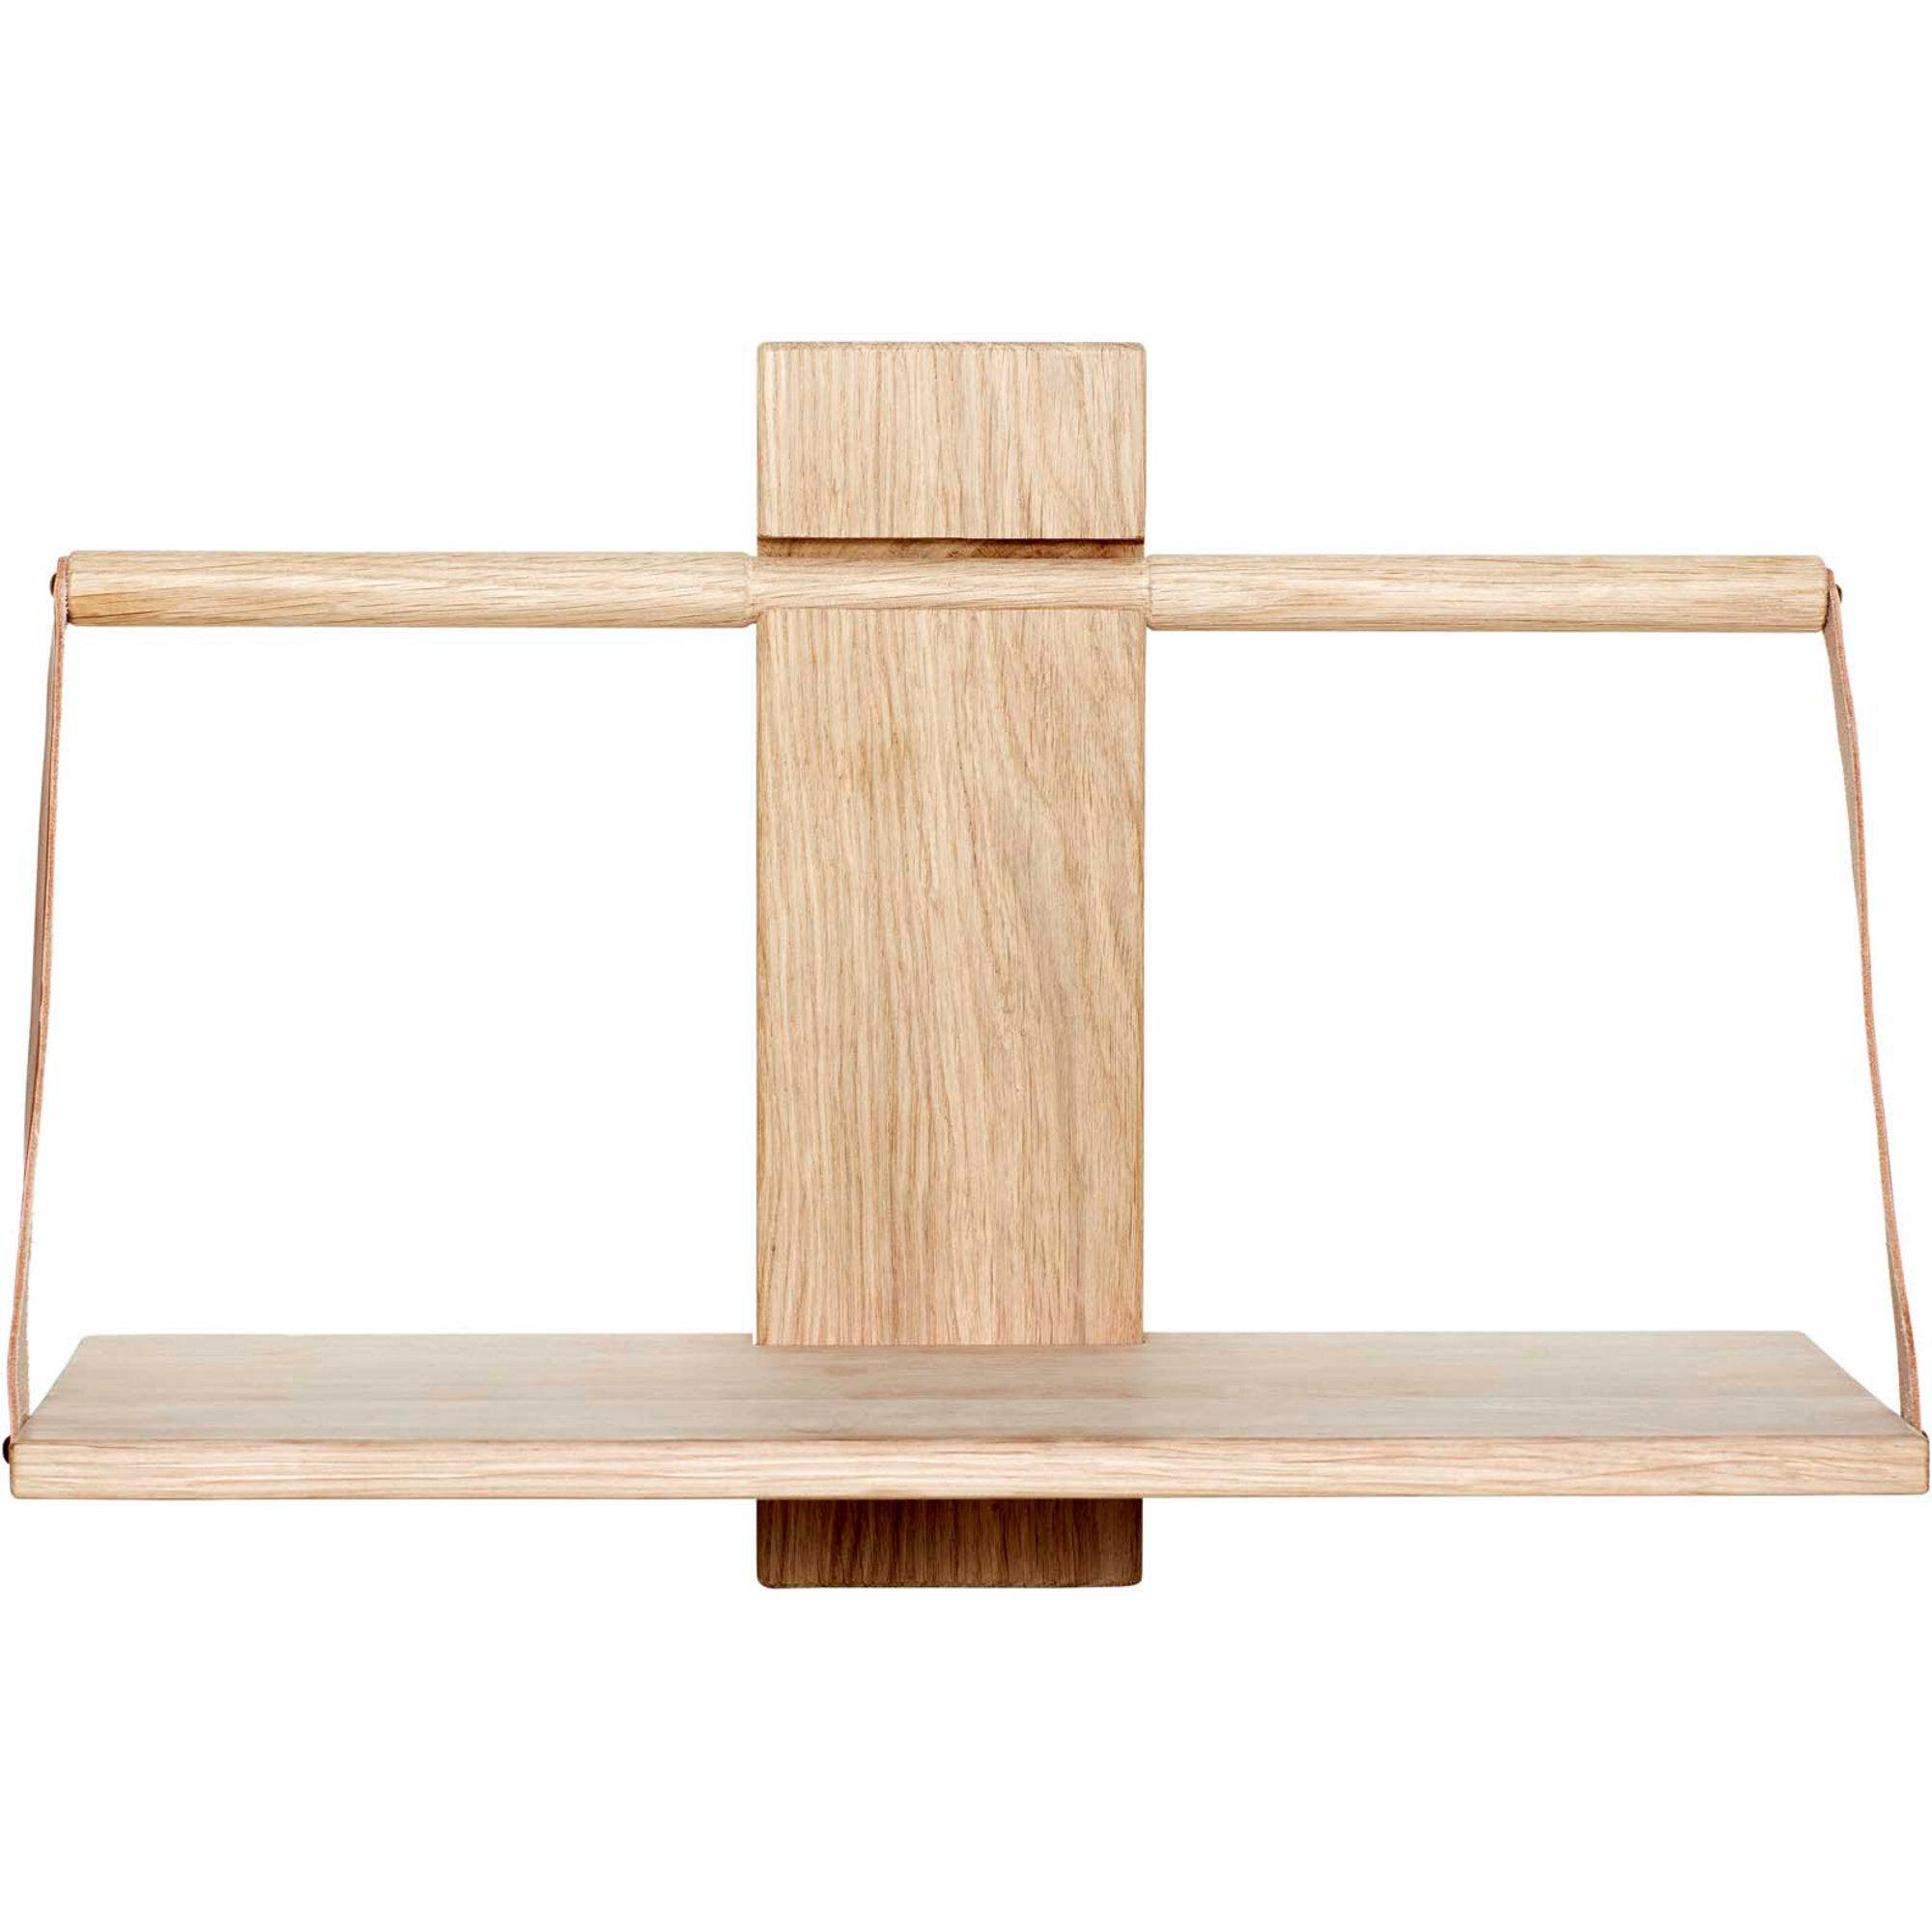 Andersen Furniture Wood wall Shelf 45 x 20 x 32 cm Medium Oak